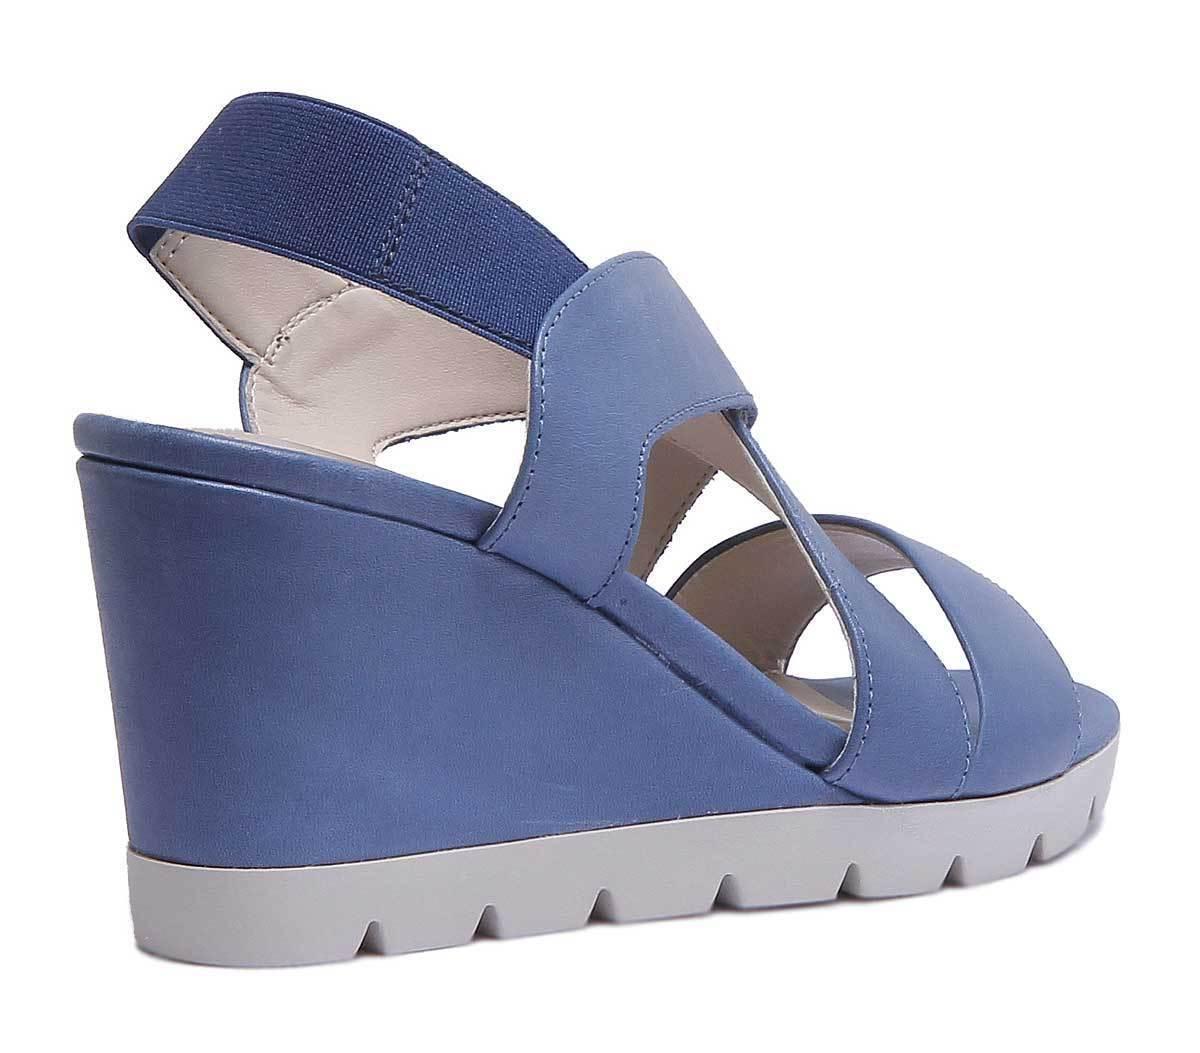 The Flexx Came Lot Women Leather Matt Denim Strappy Strappy Strappy Wedge Sandals Size UK 3 - 8 7b4333